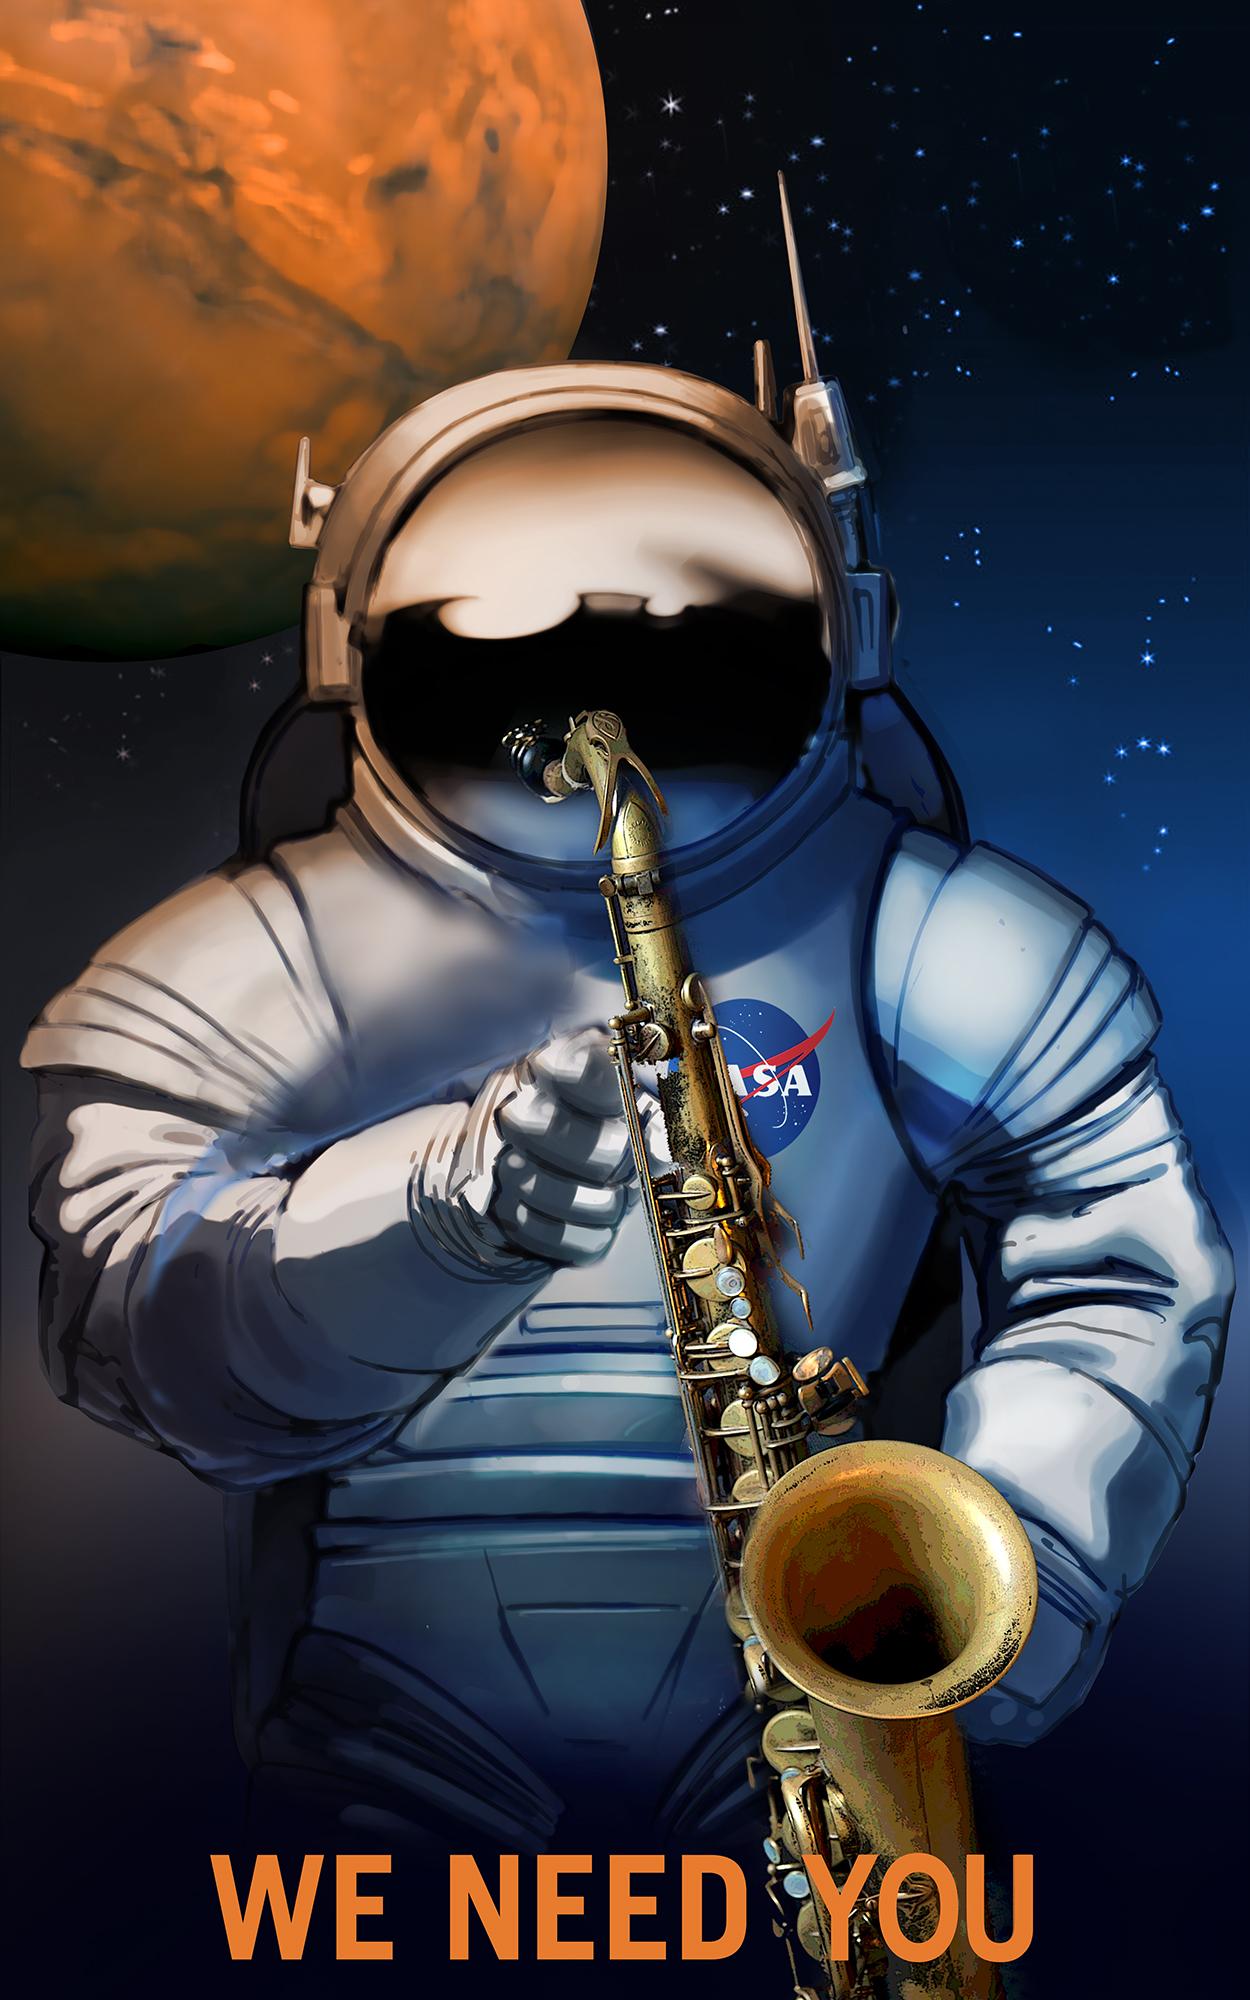 P08-We-Need-You-NASA-Recruitment-Poster.jpg